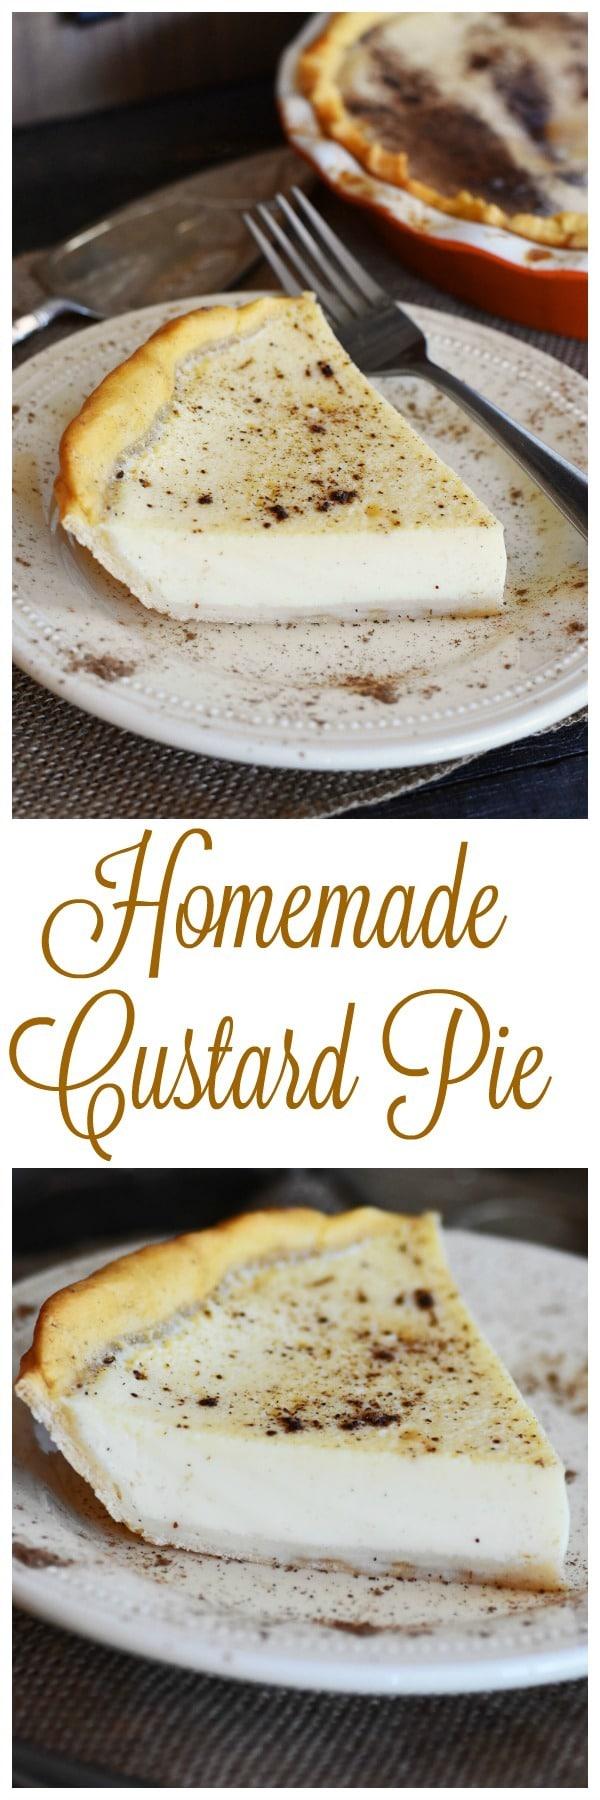 homemade-custard-pie1